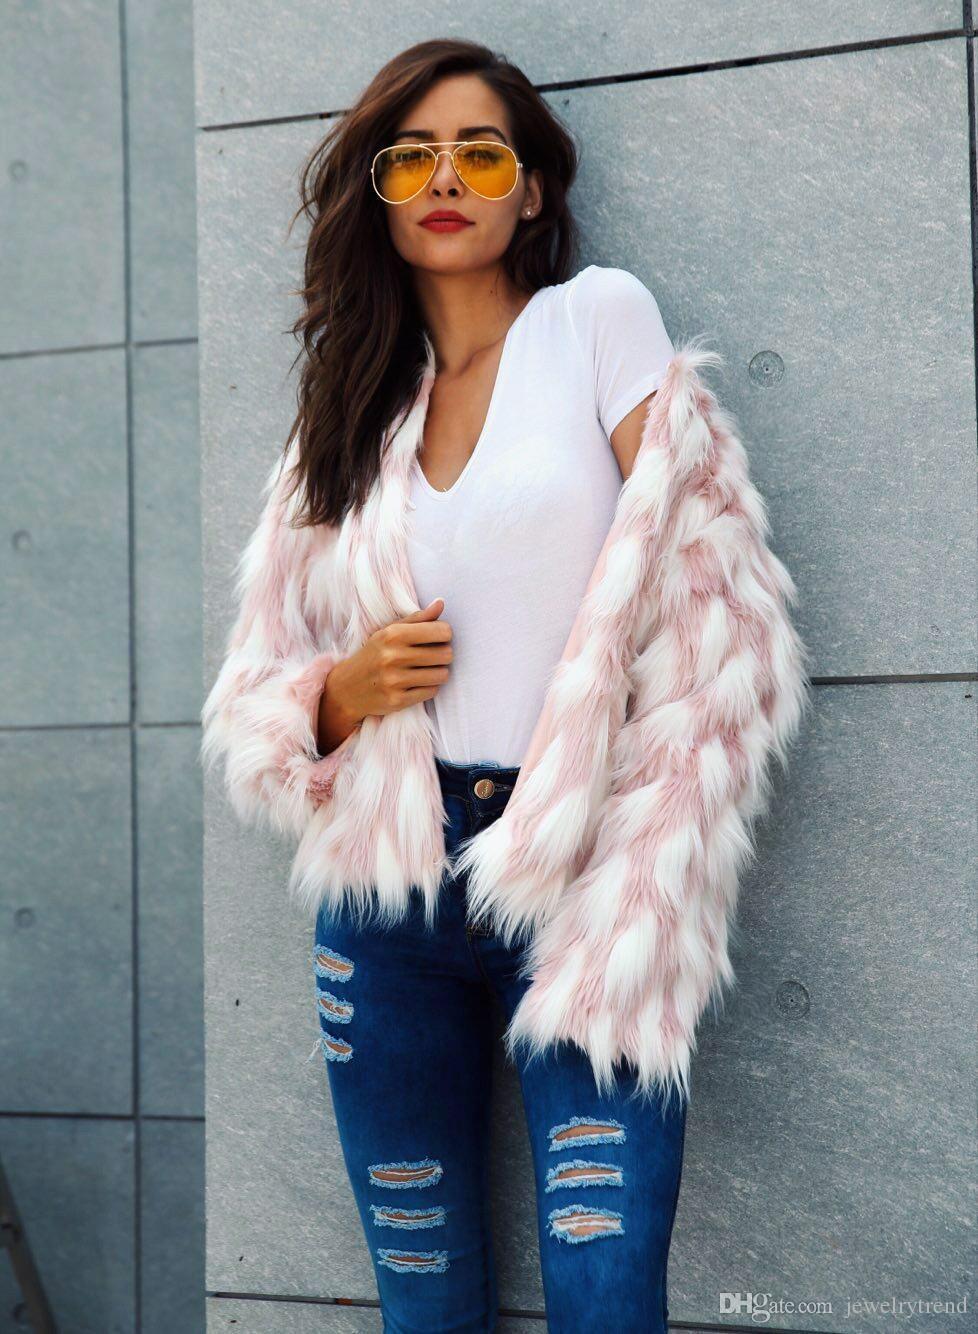 New Autumn Winter Women's Faux Fur Jacket Coat Pink White Parthwork Lady's Female Short Outerwear Coats Capa C3932